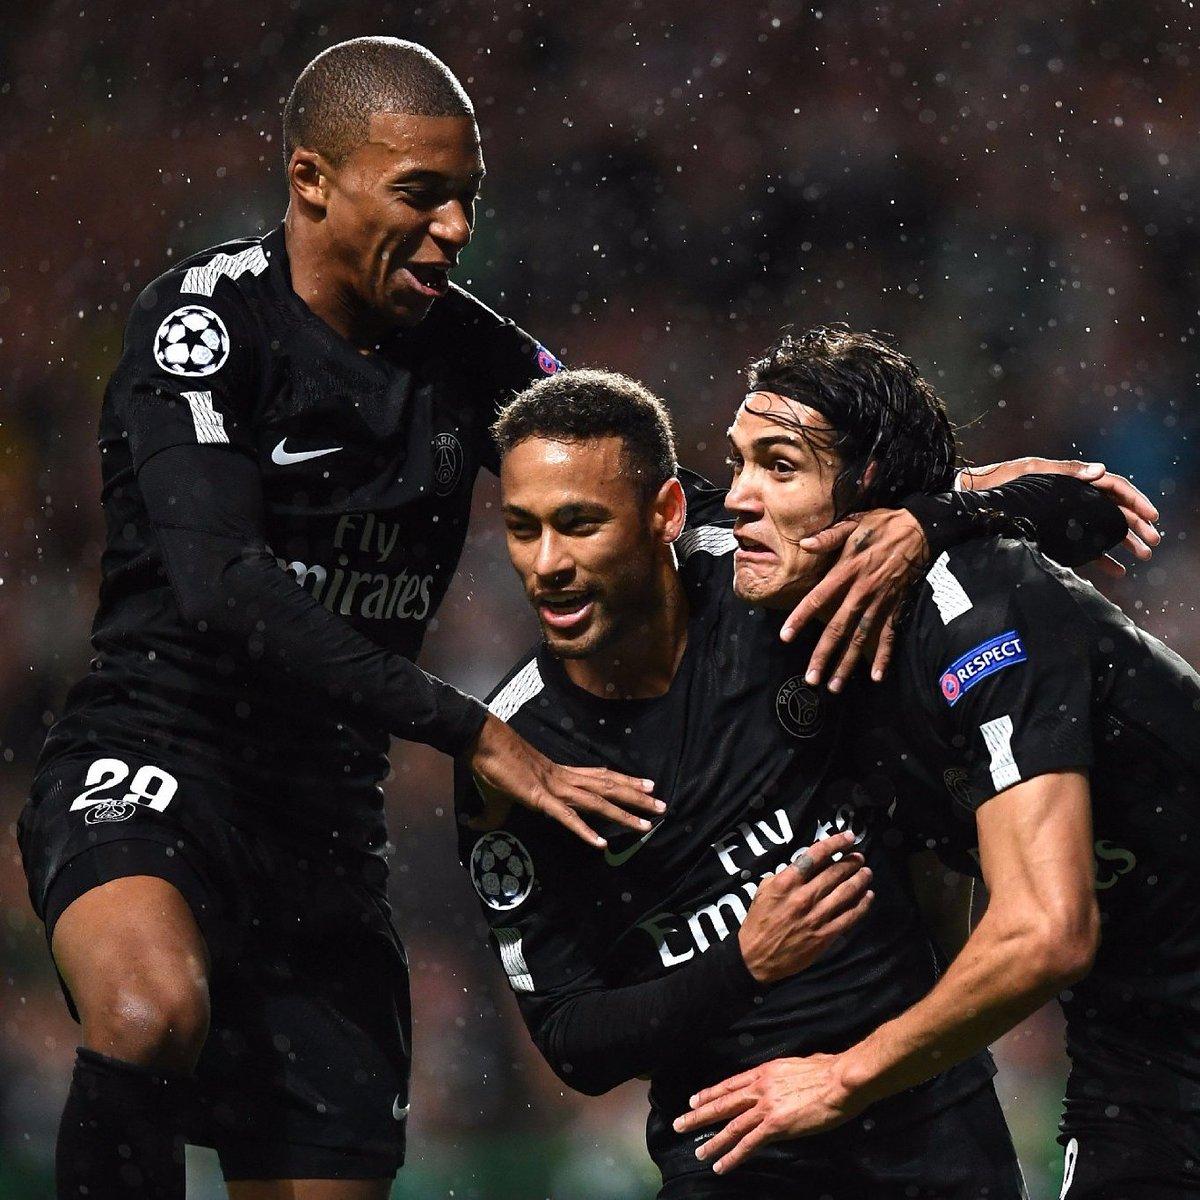 Que ataque da porra! Neymar 5 jogos, 5 gols. Mbappé 2 jogos, 2 gols. Cavani 6 jogos, 8 gols.